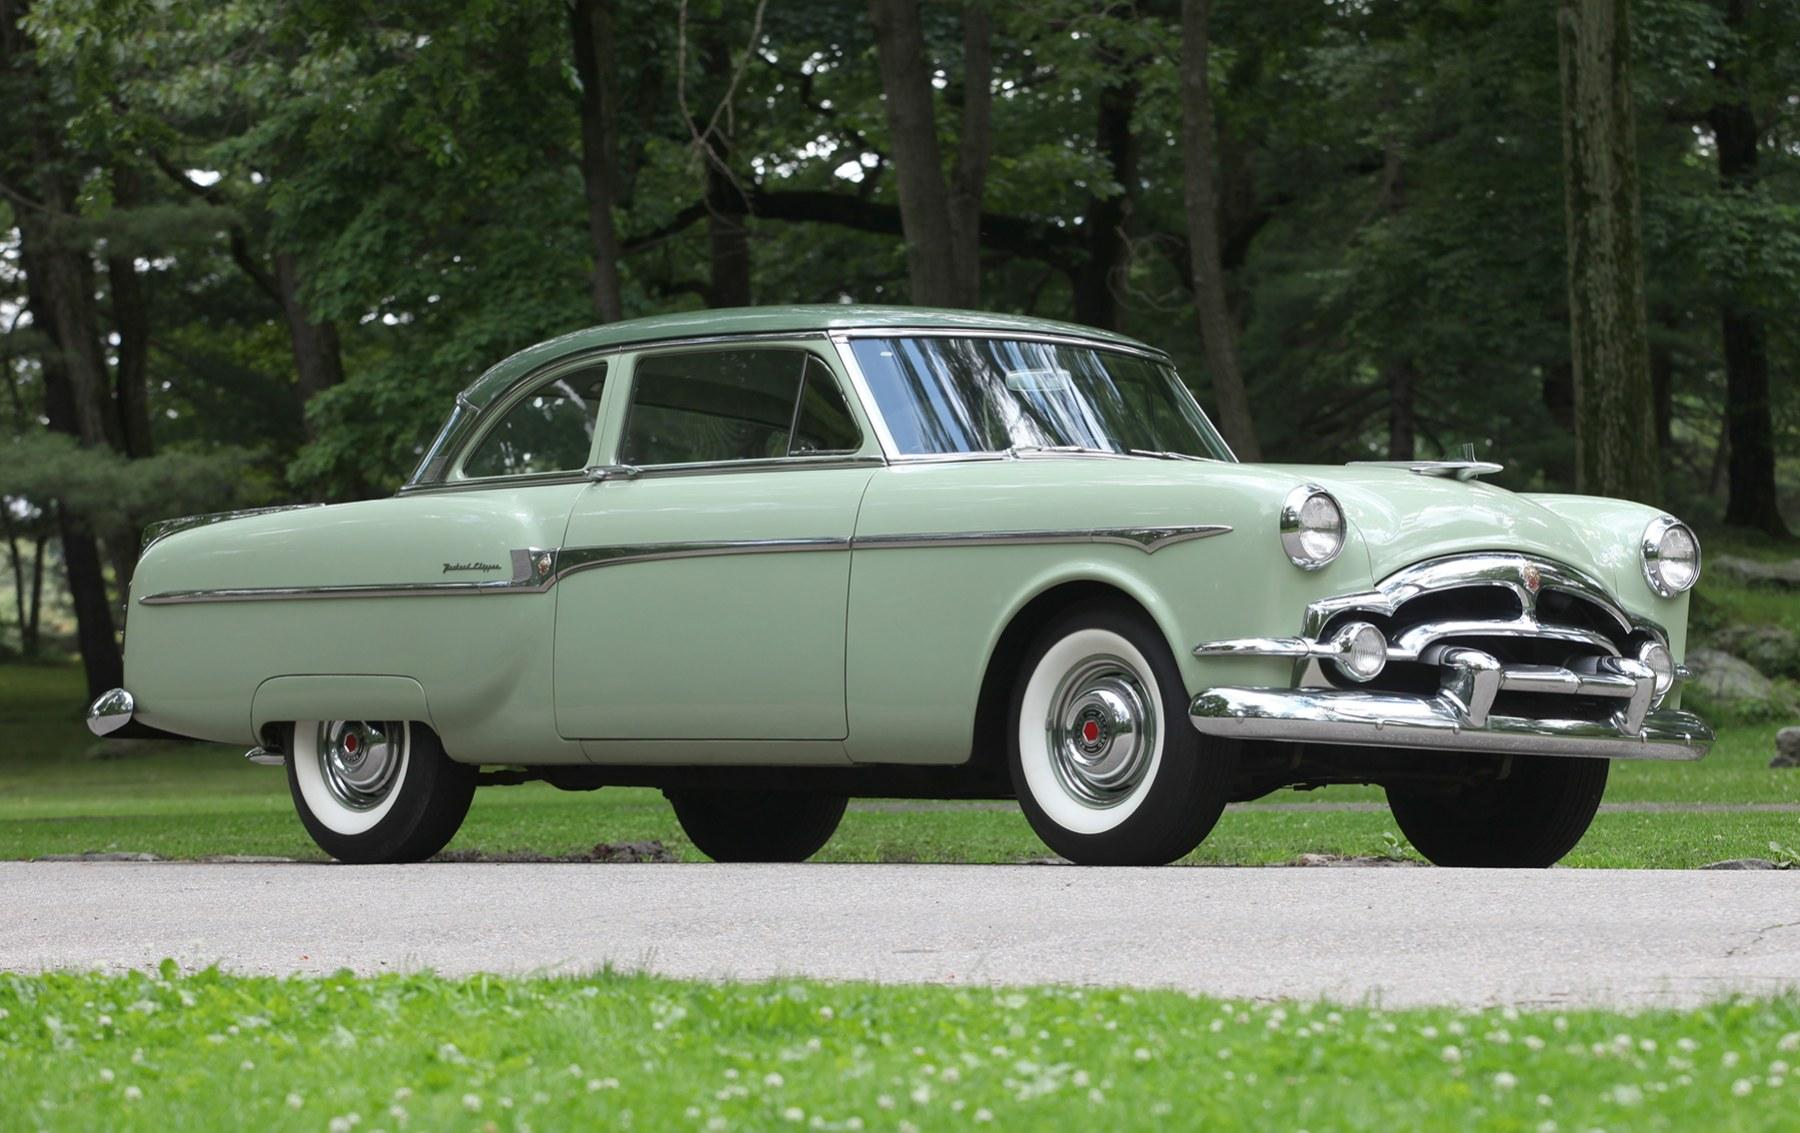 1953 Packard Clipper Deluxe Club Sedan